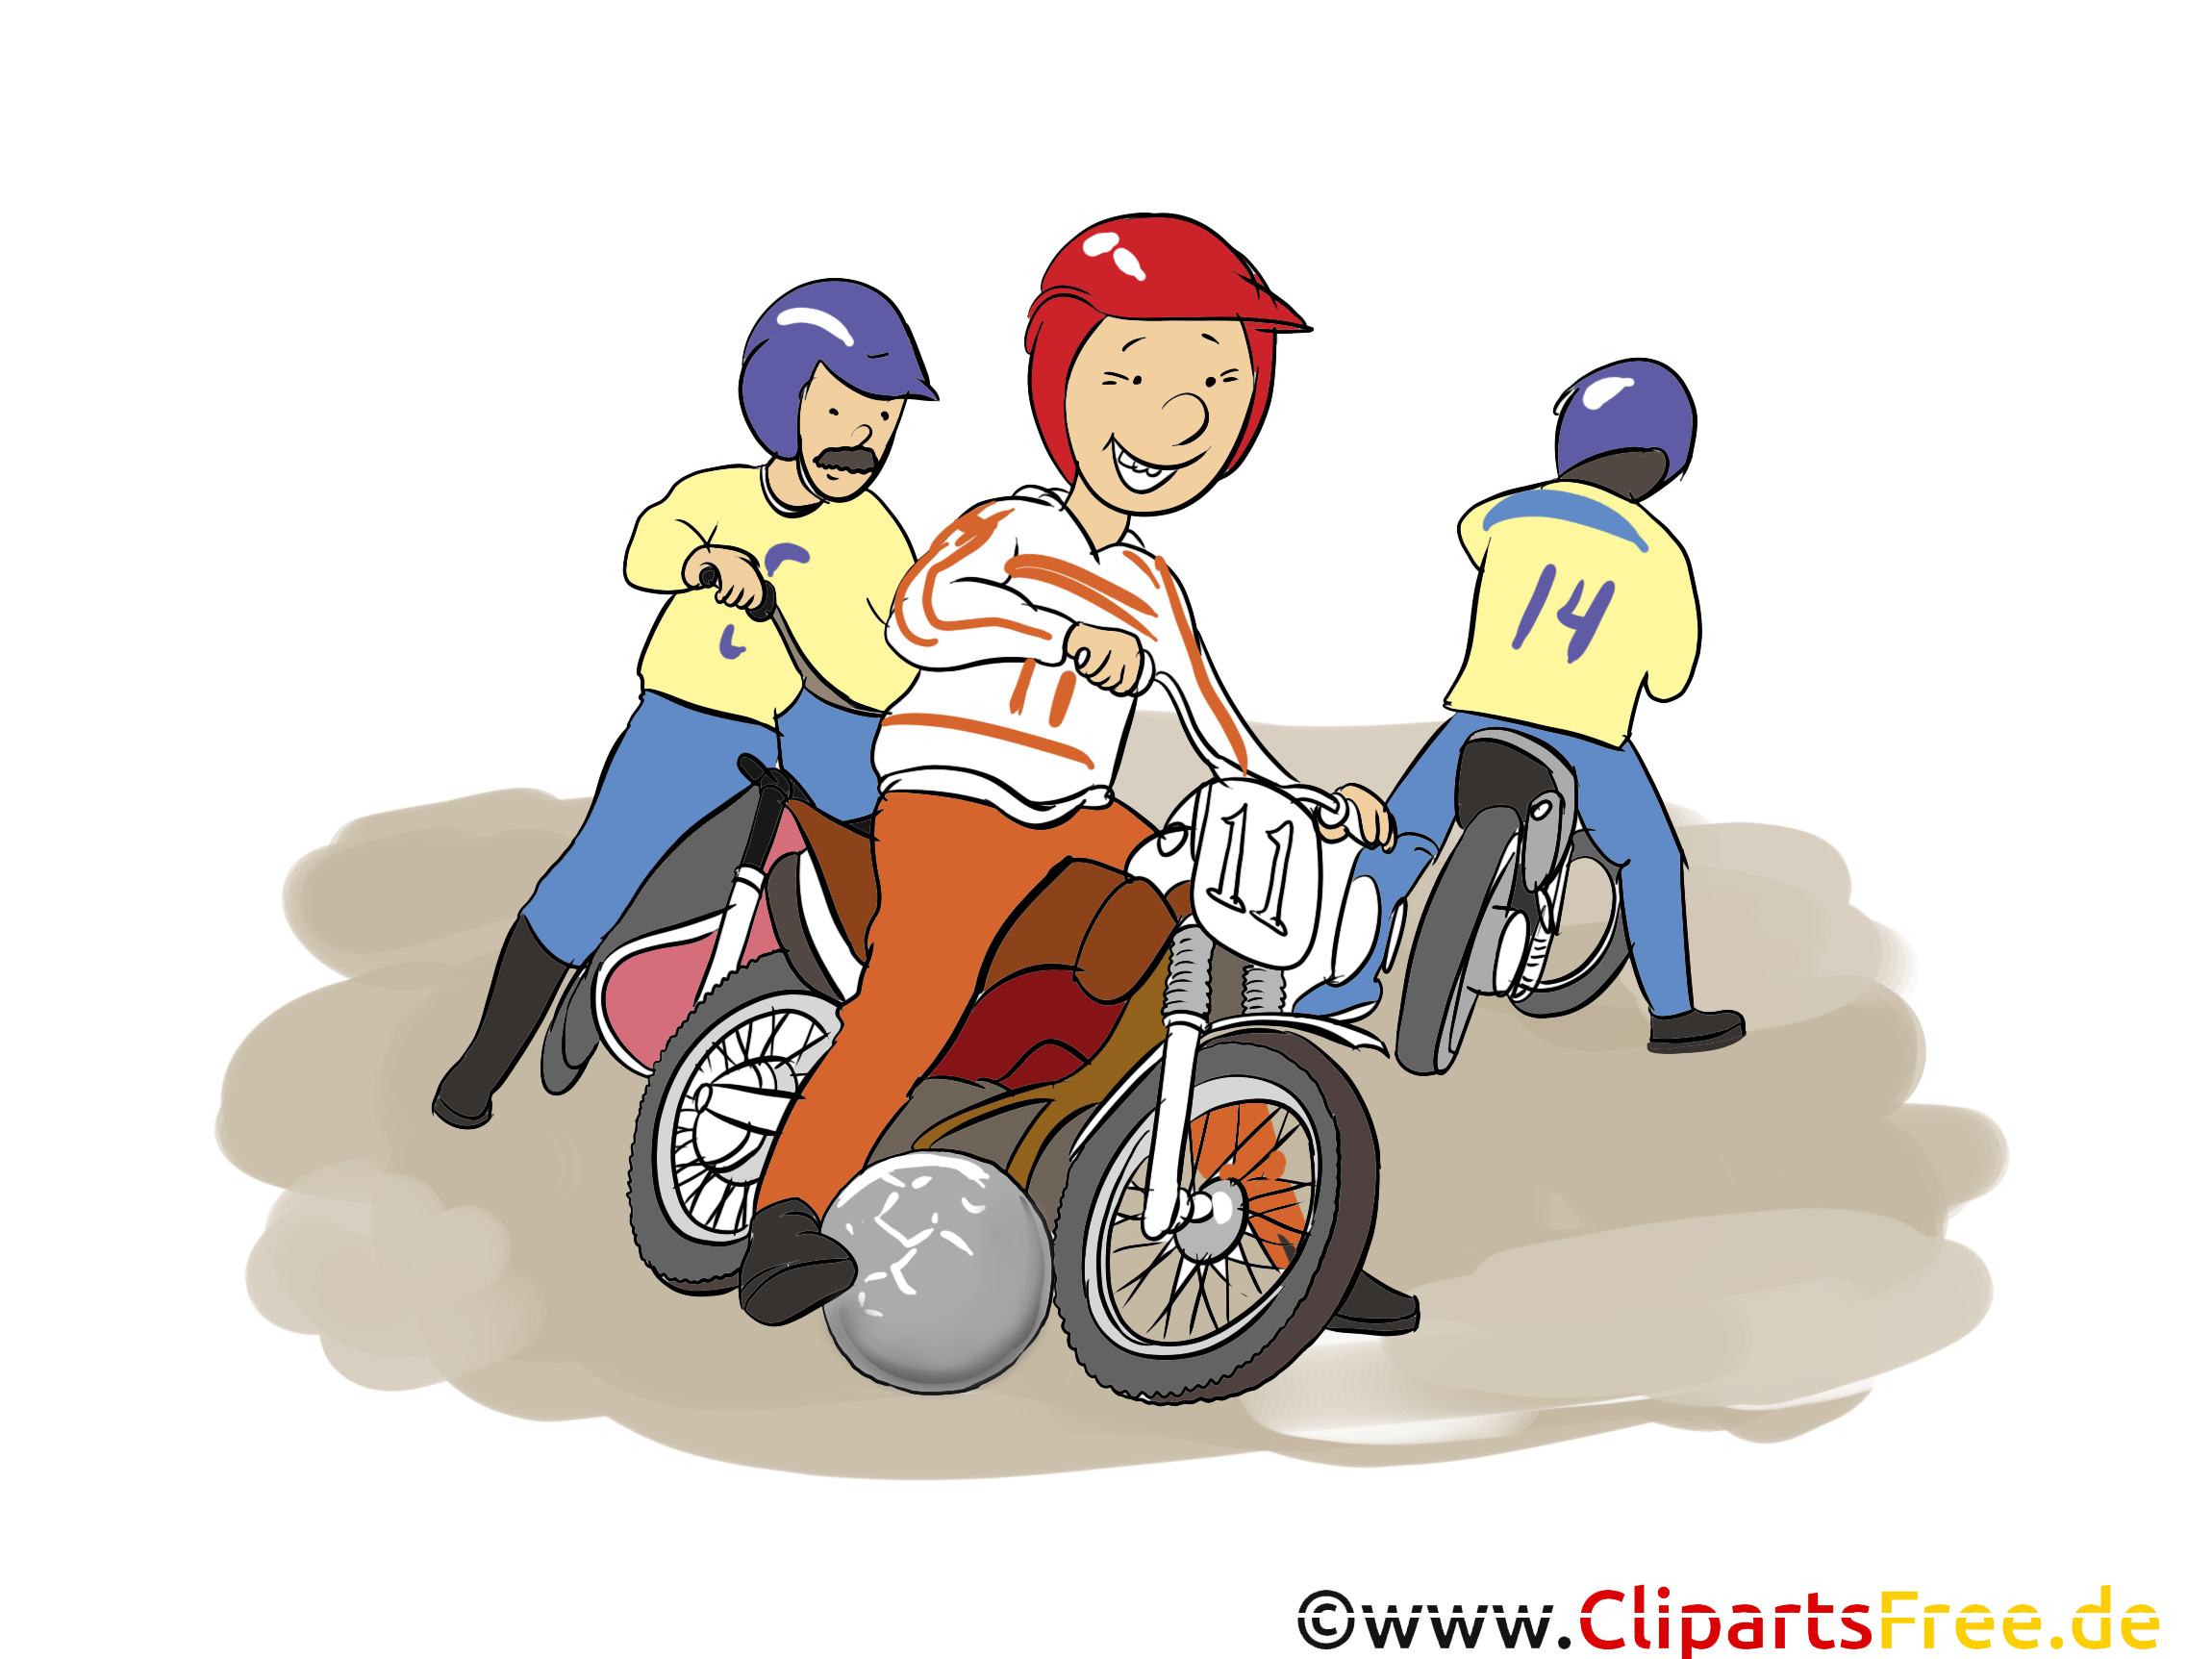 Motoballのグラフィック、イラスト、絵、漫画、画像